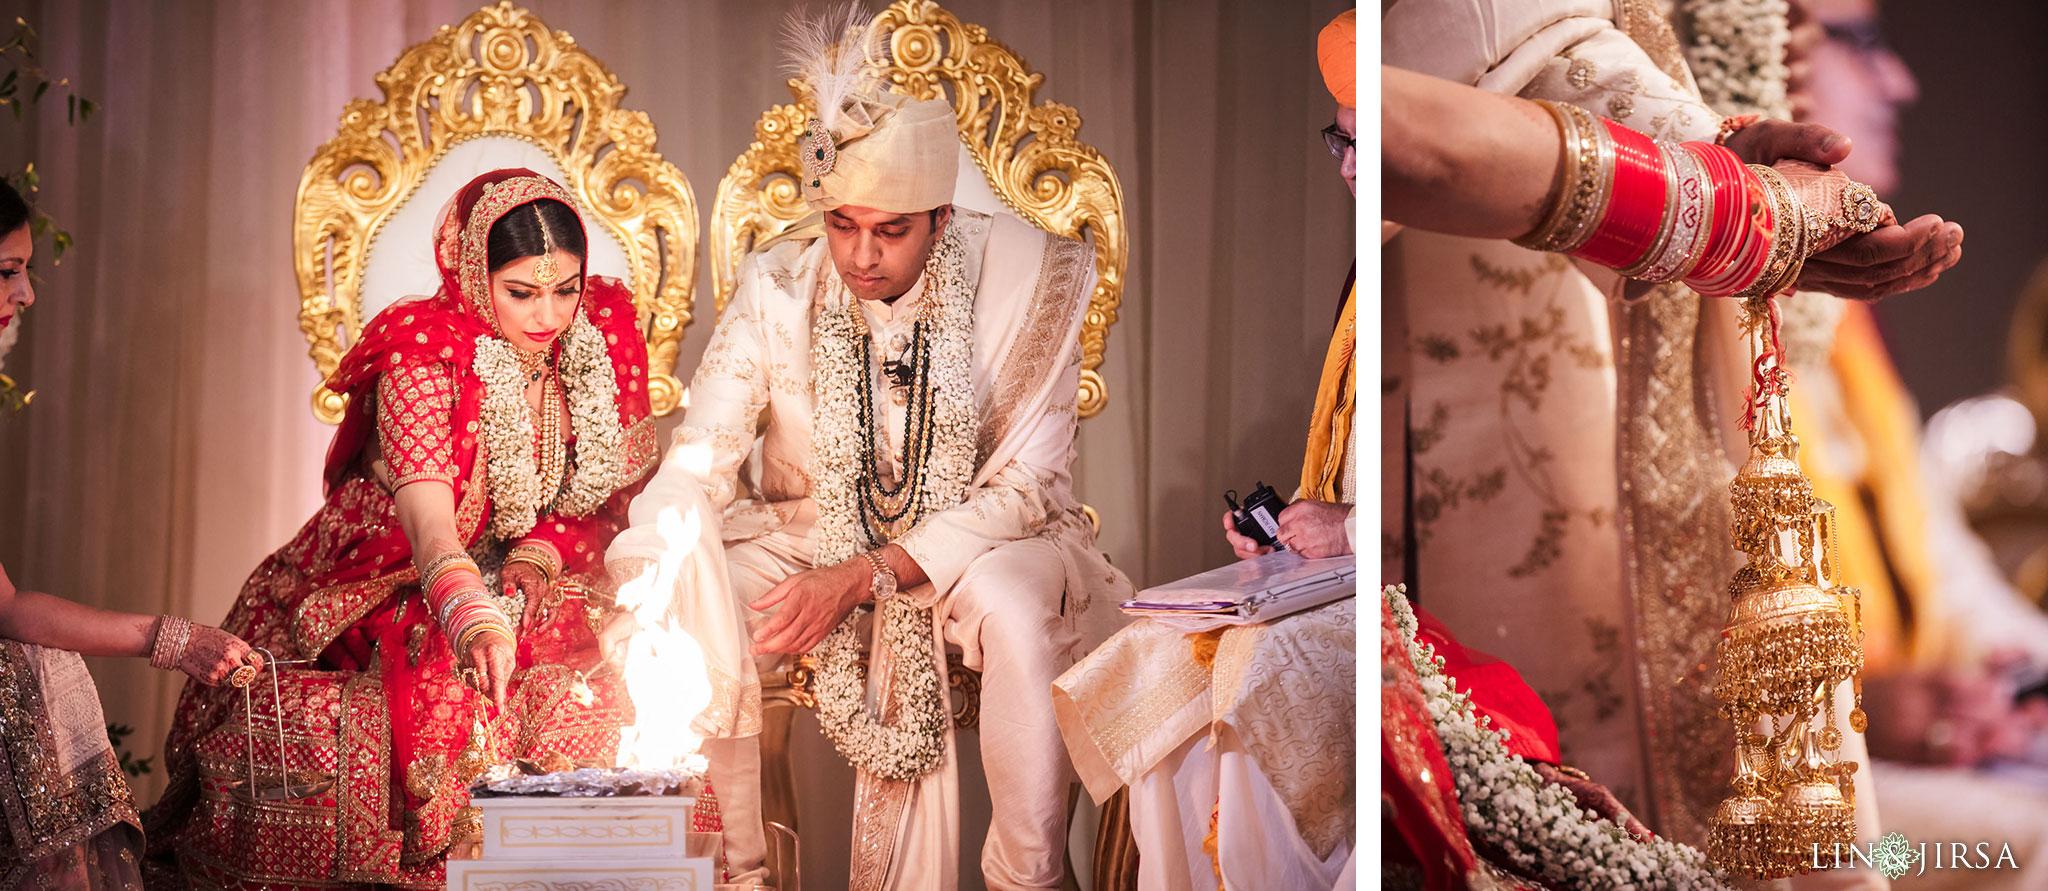 30 Ritz Carlton St Louis Missouri Indian Wedding Photography